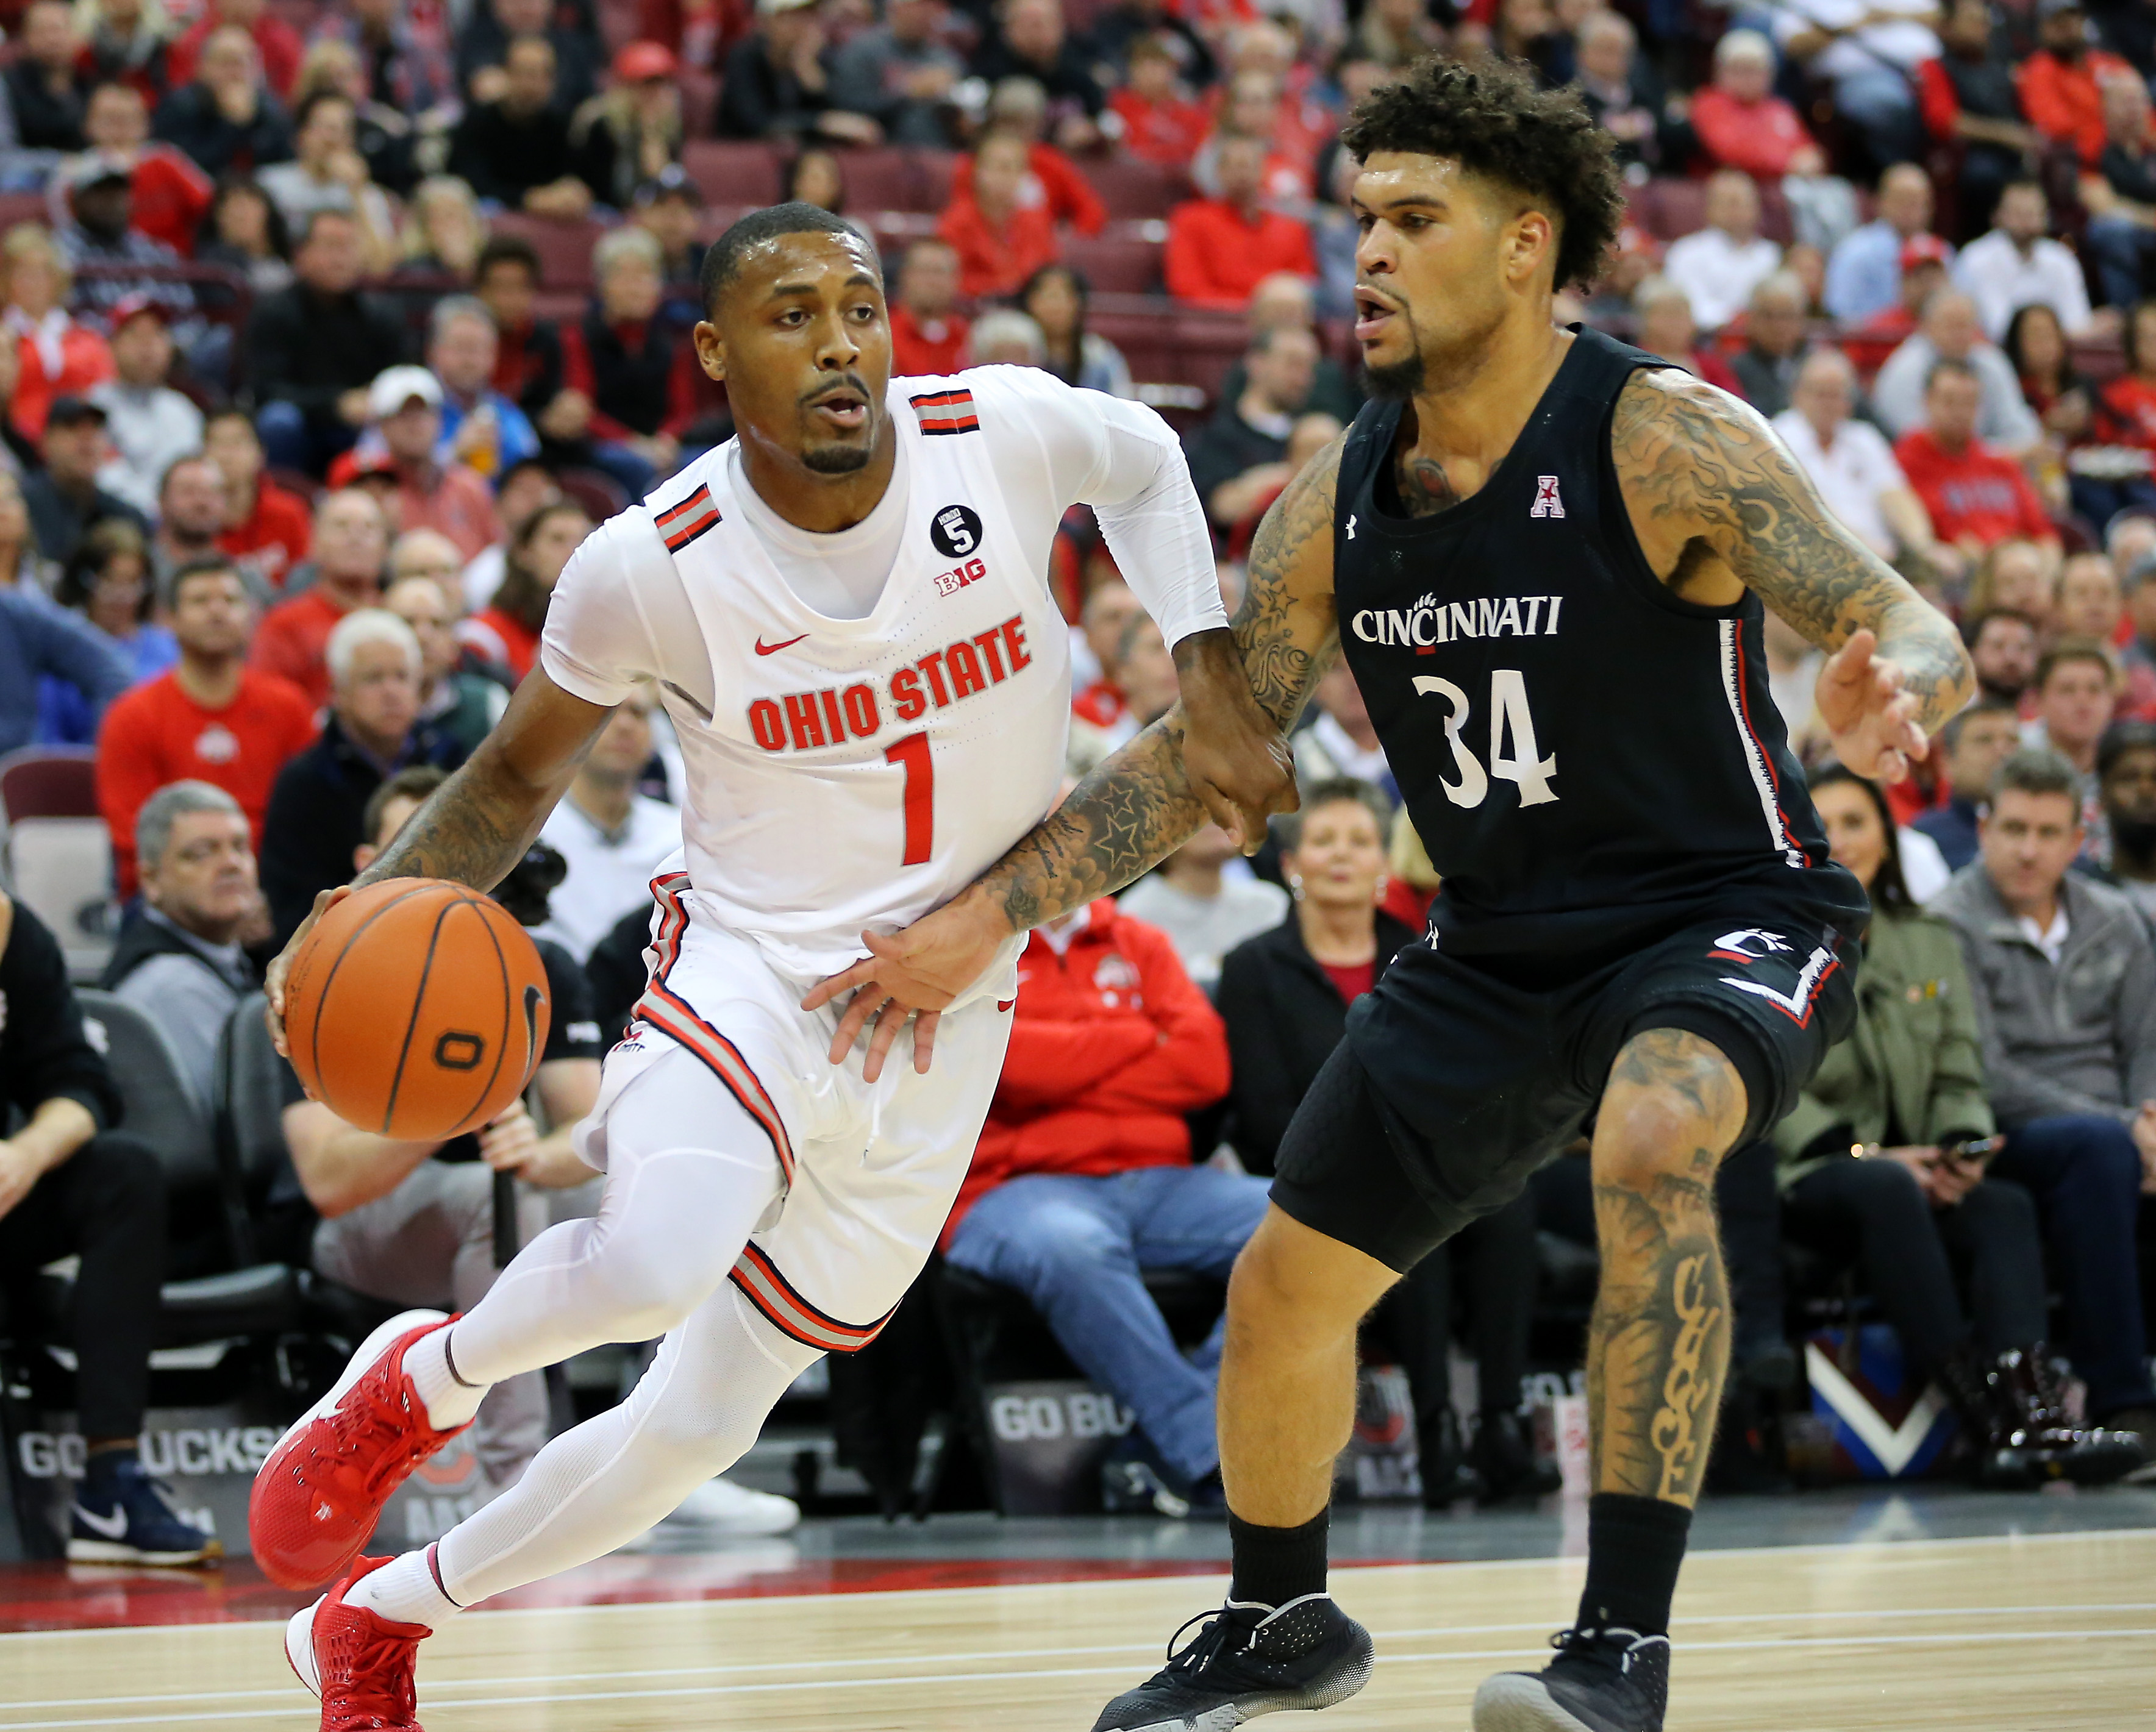 NCAA Basketball: Cincinnati at Ohio State